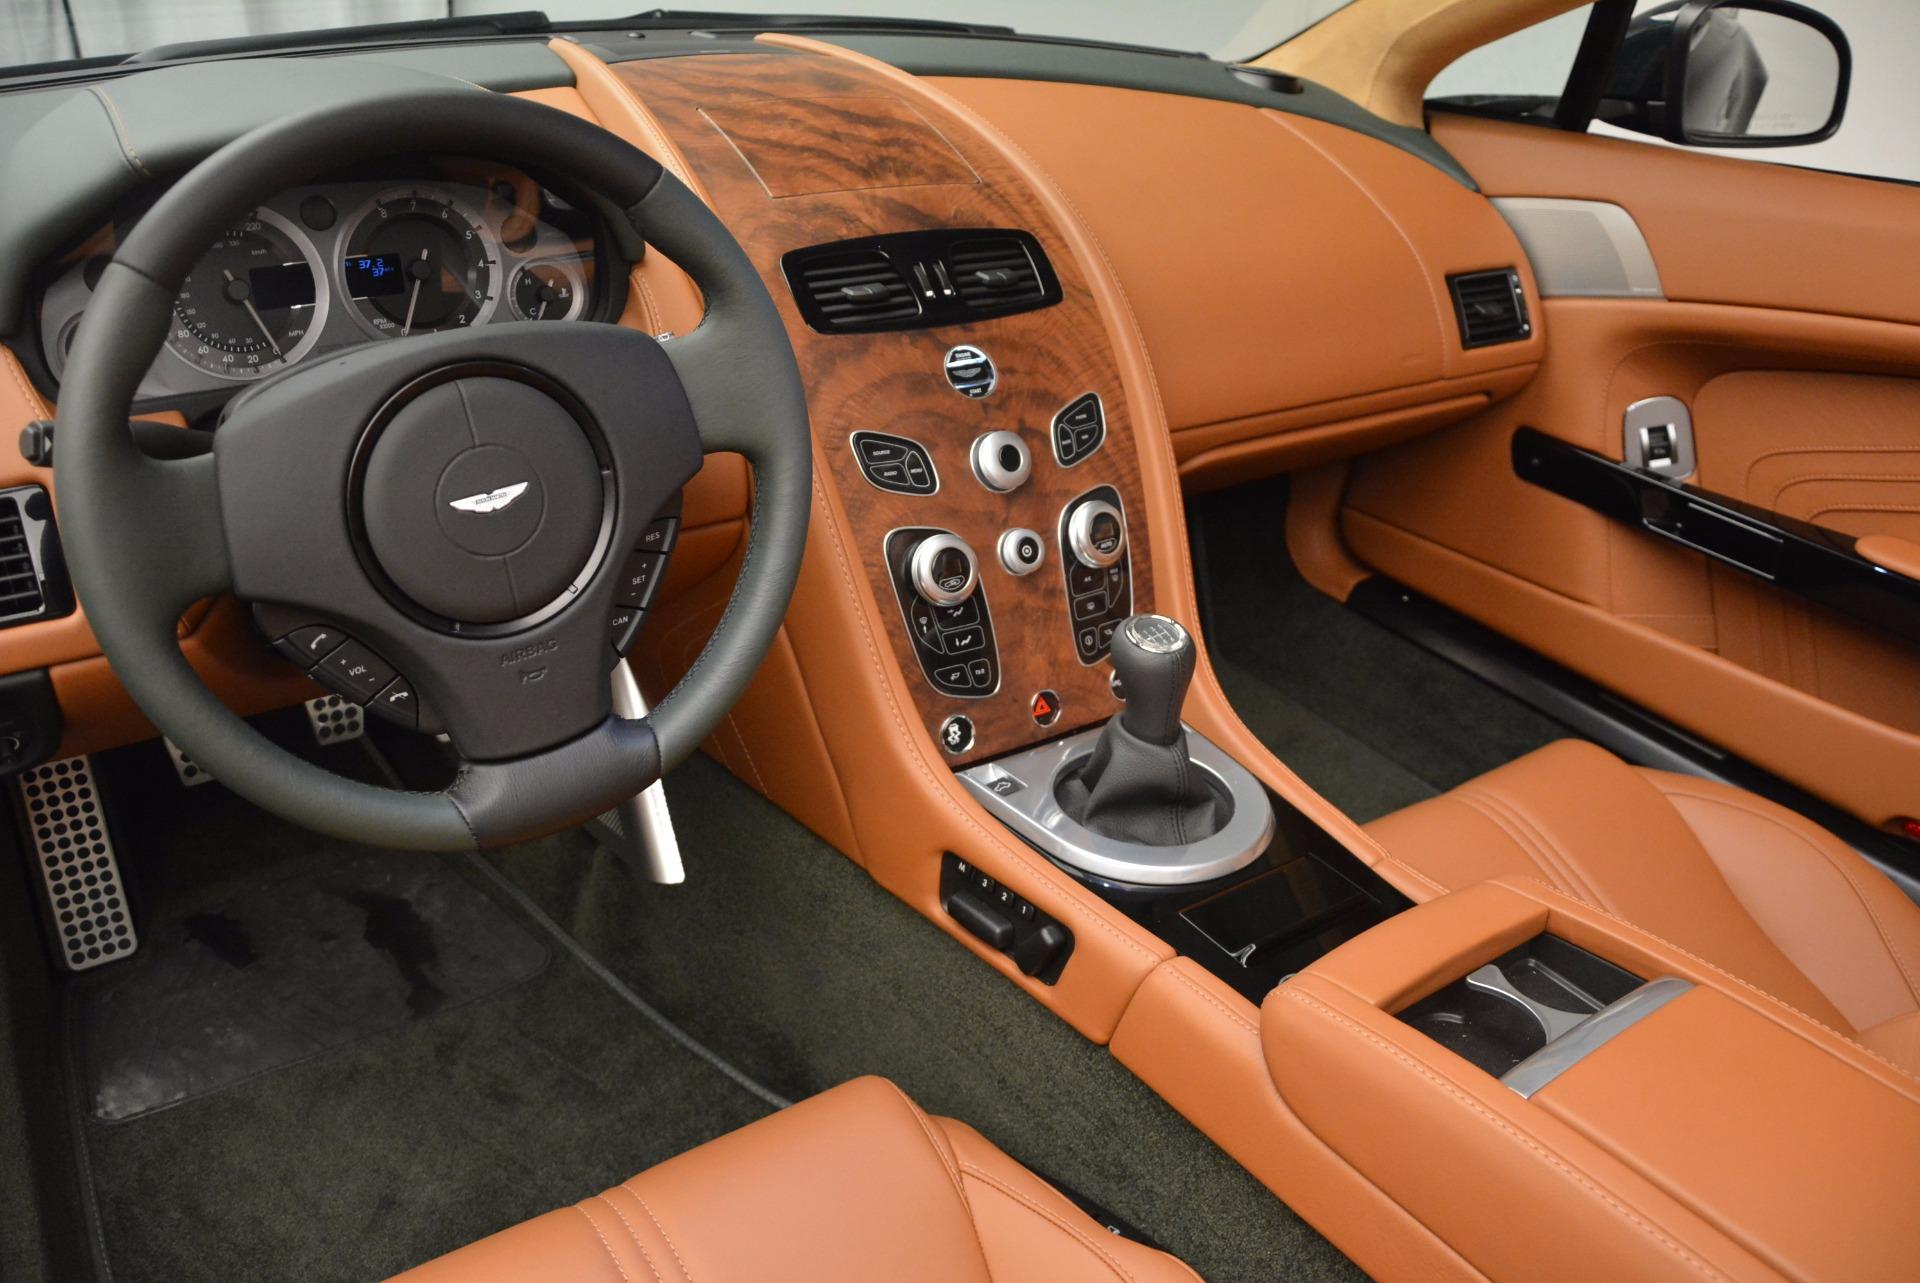 Used 2016 Aston Martin V8 Vantage S Roadster For Sale In Westport, CT 1550_p20